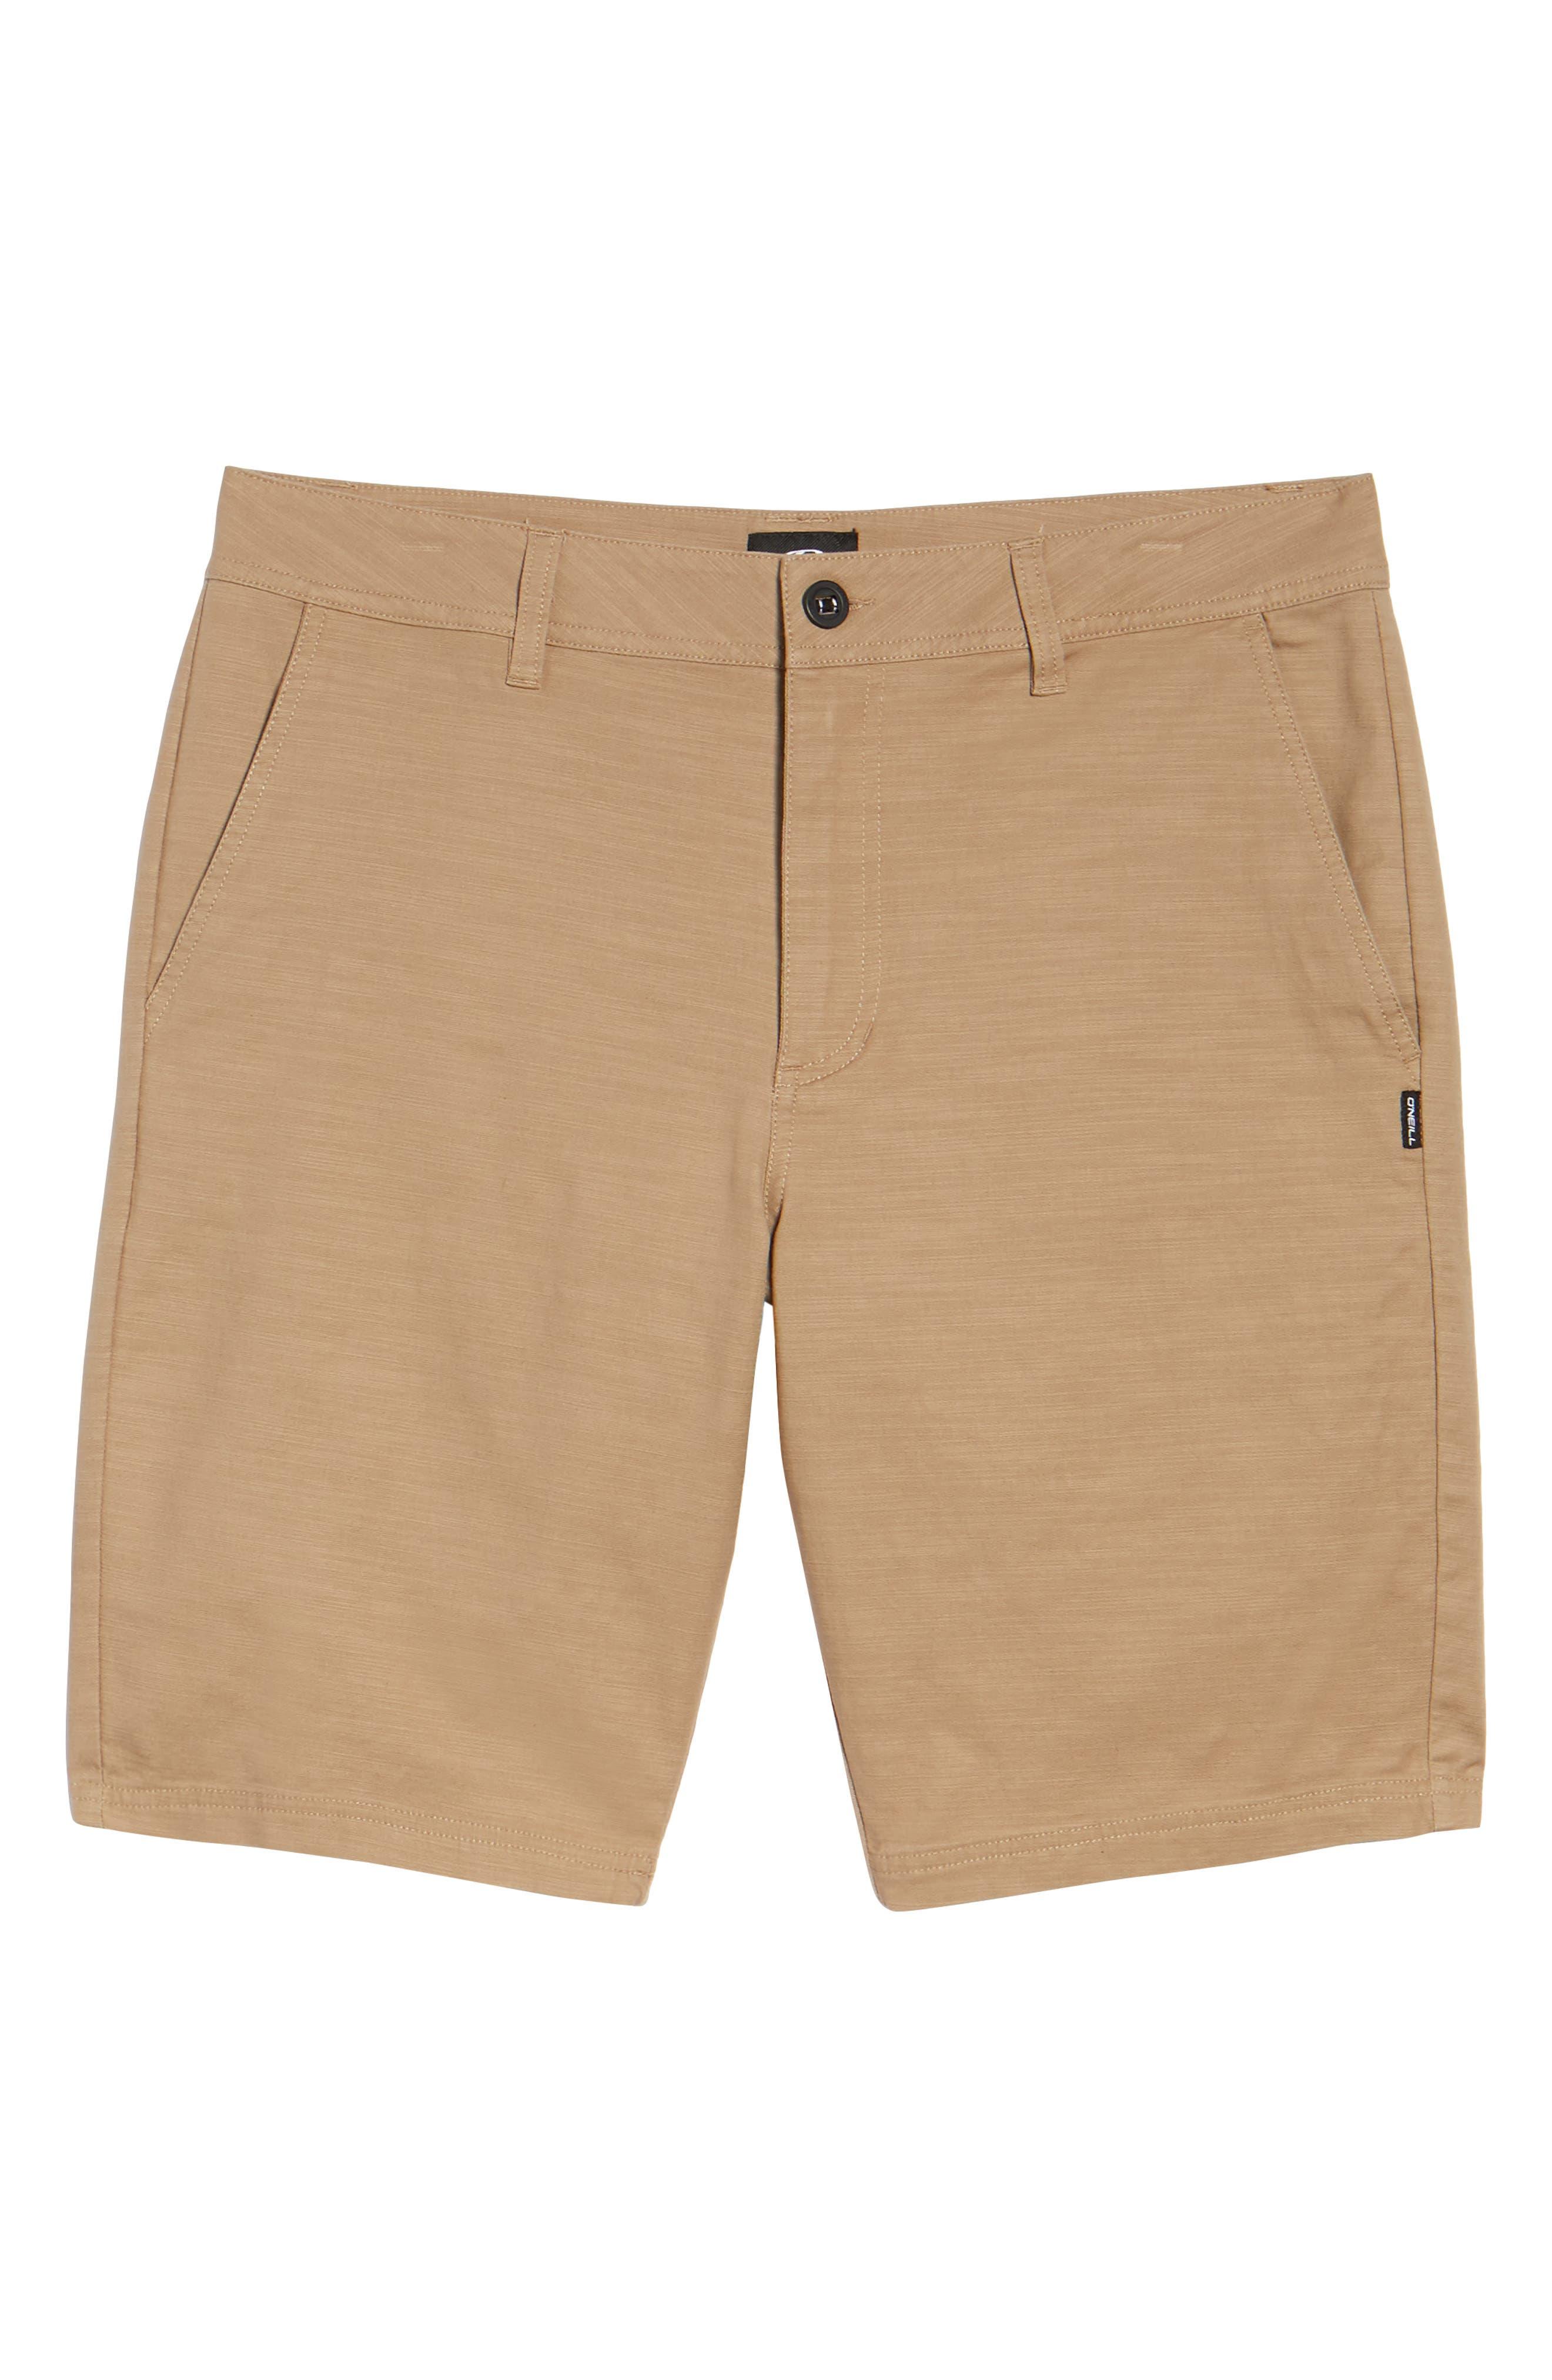 Jay Stretch Chino Shorts,                             Alternate thumbnail 27, color,